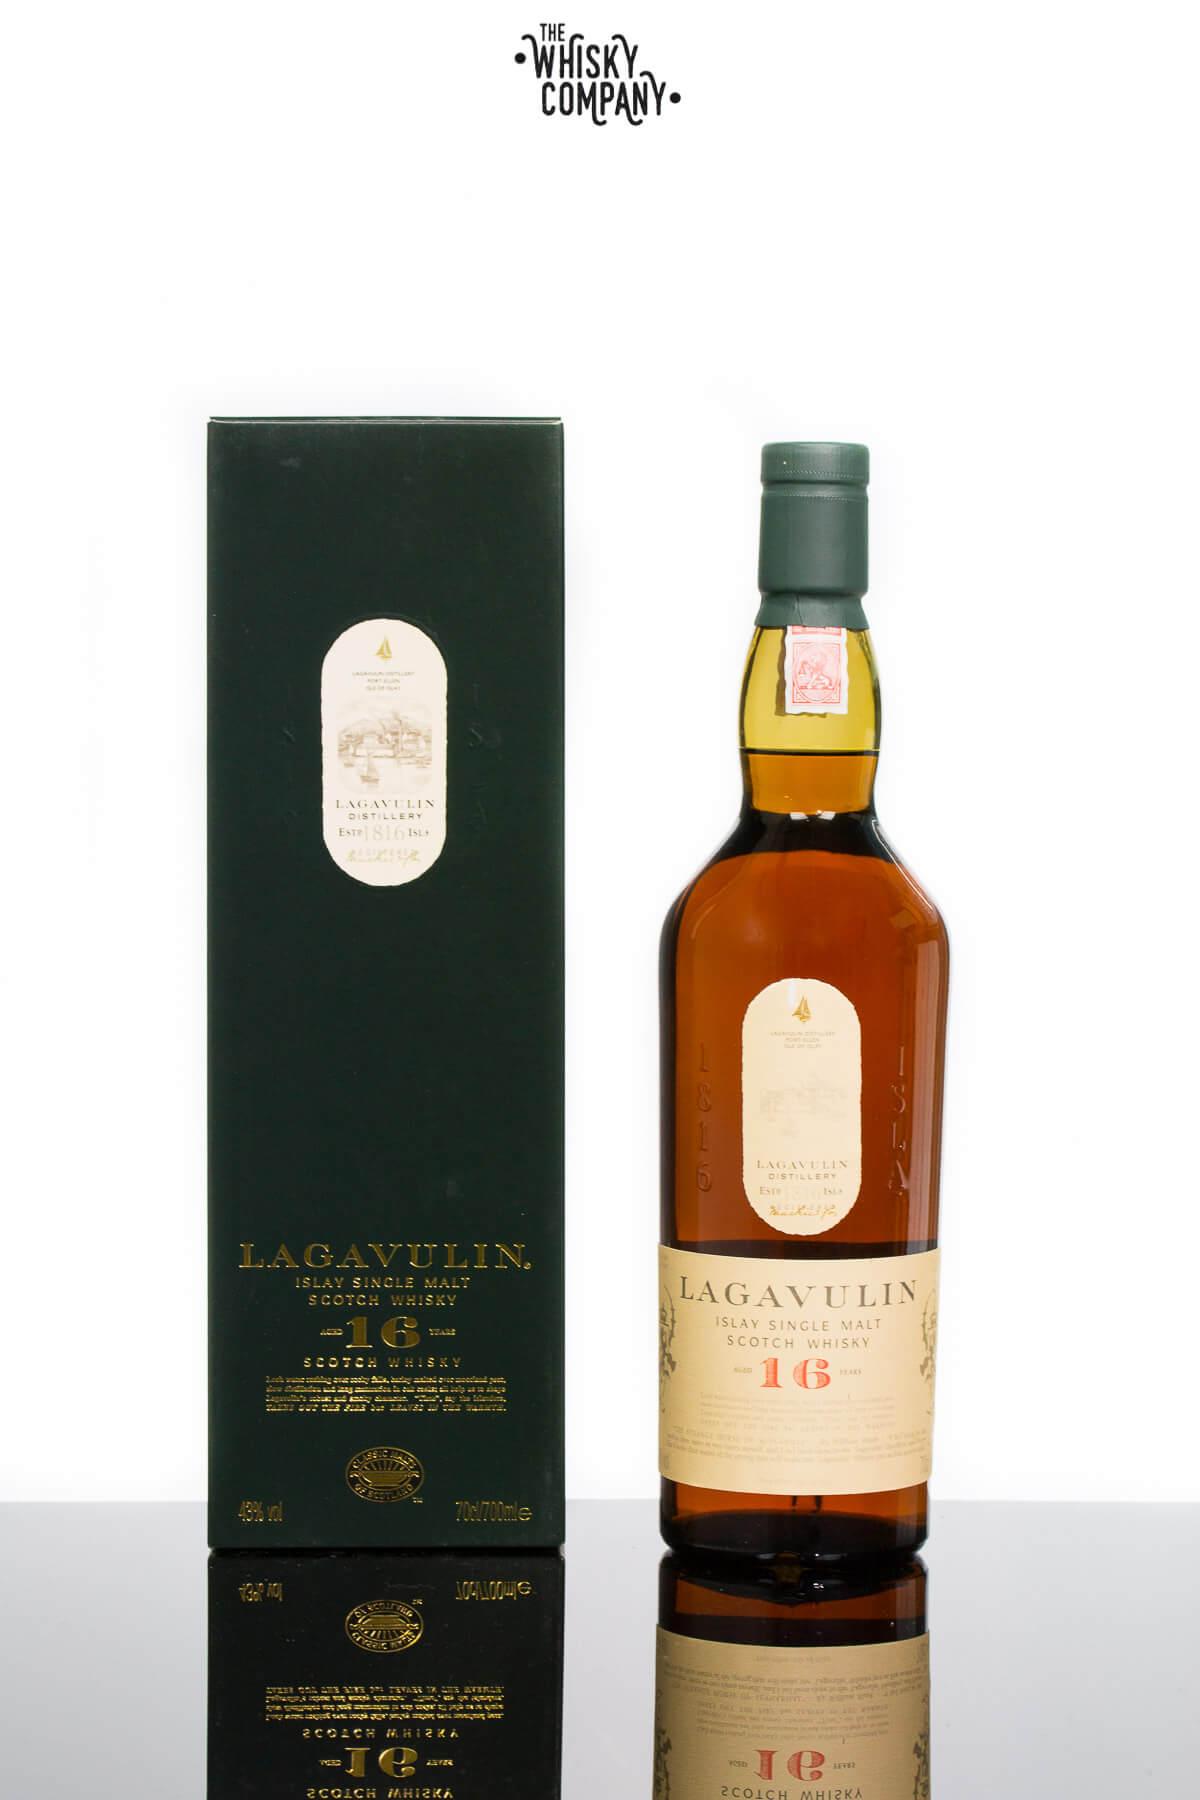 Lagavulin Aged 16 Years Islay Single Malt Scotch Whisky